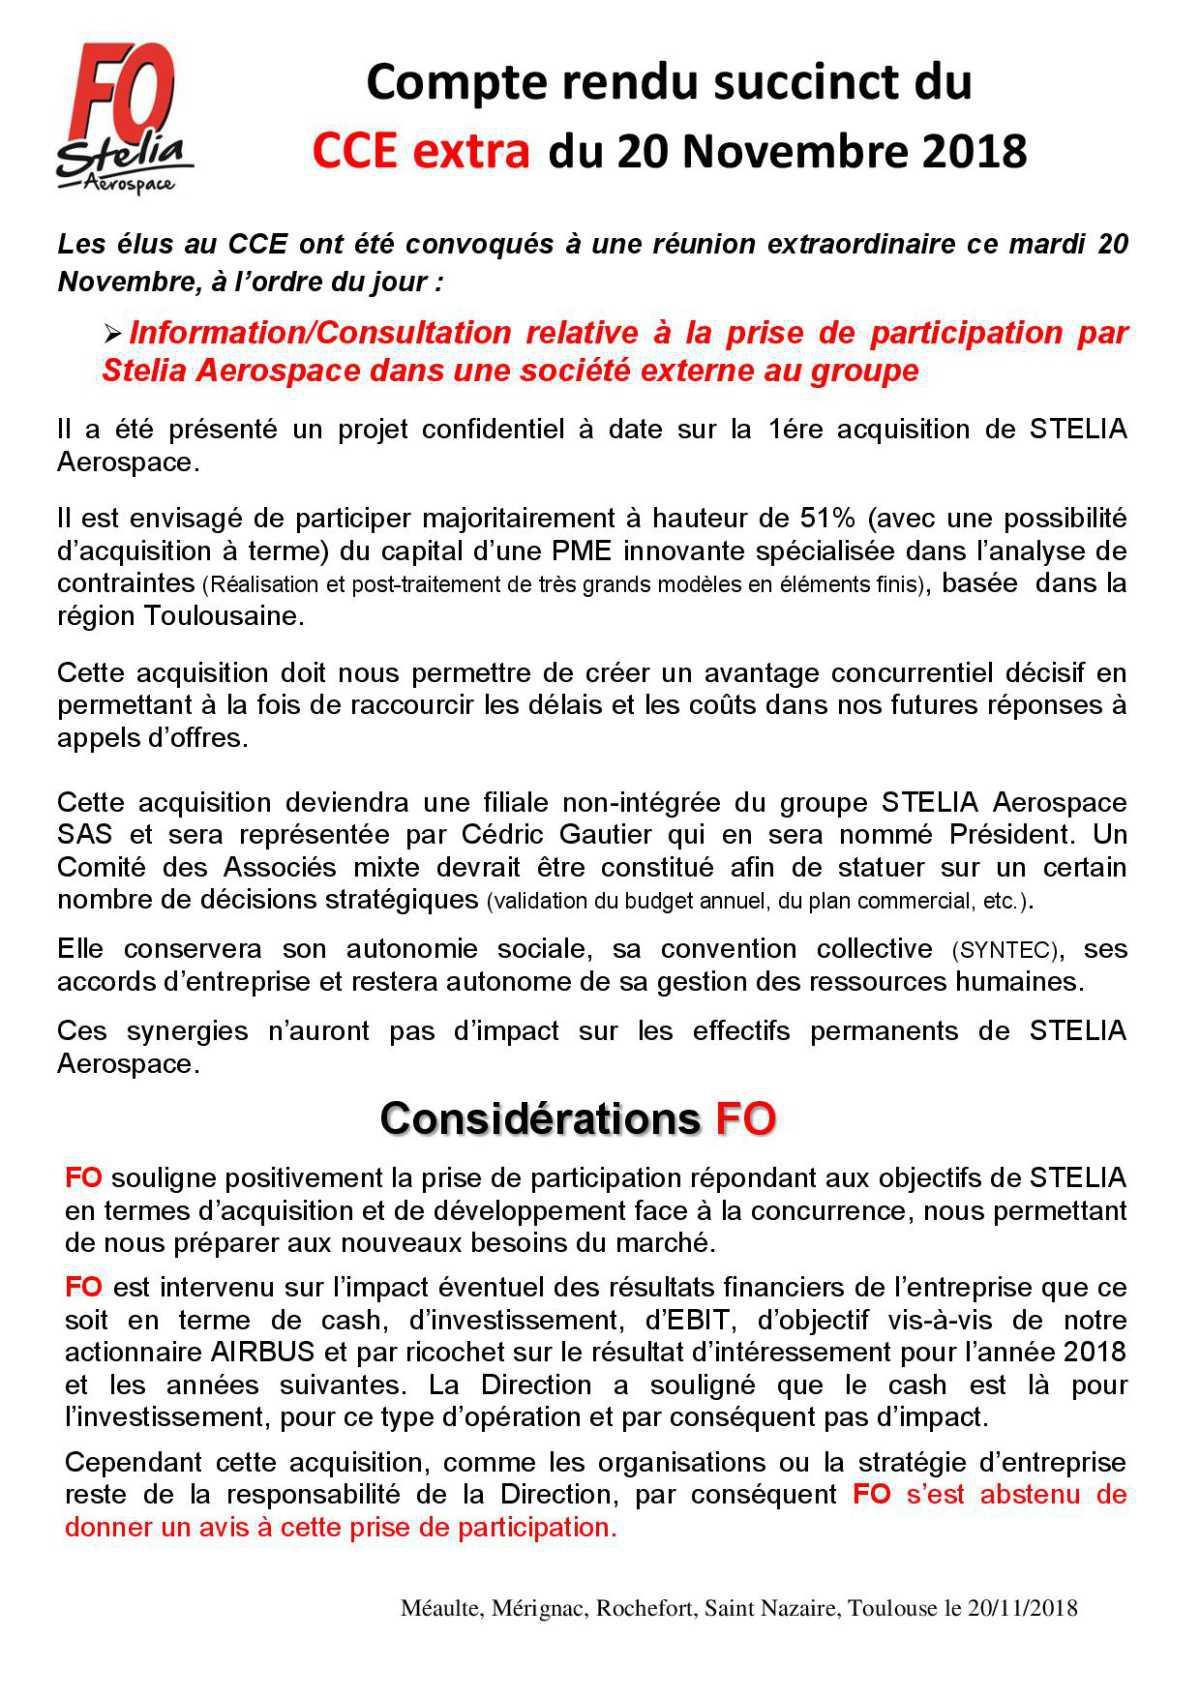 CR succinct du CCE extra du 20/11/2018